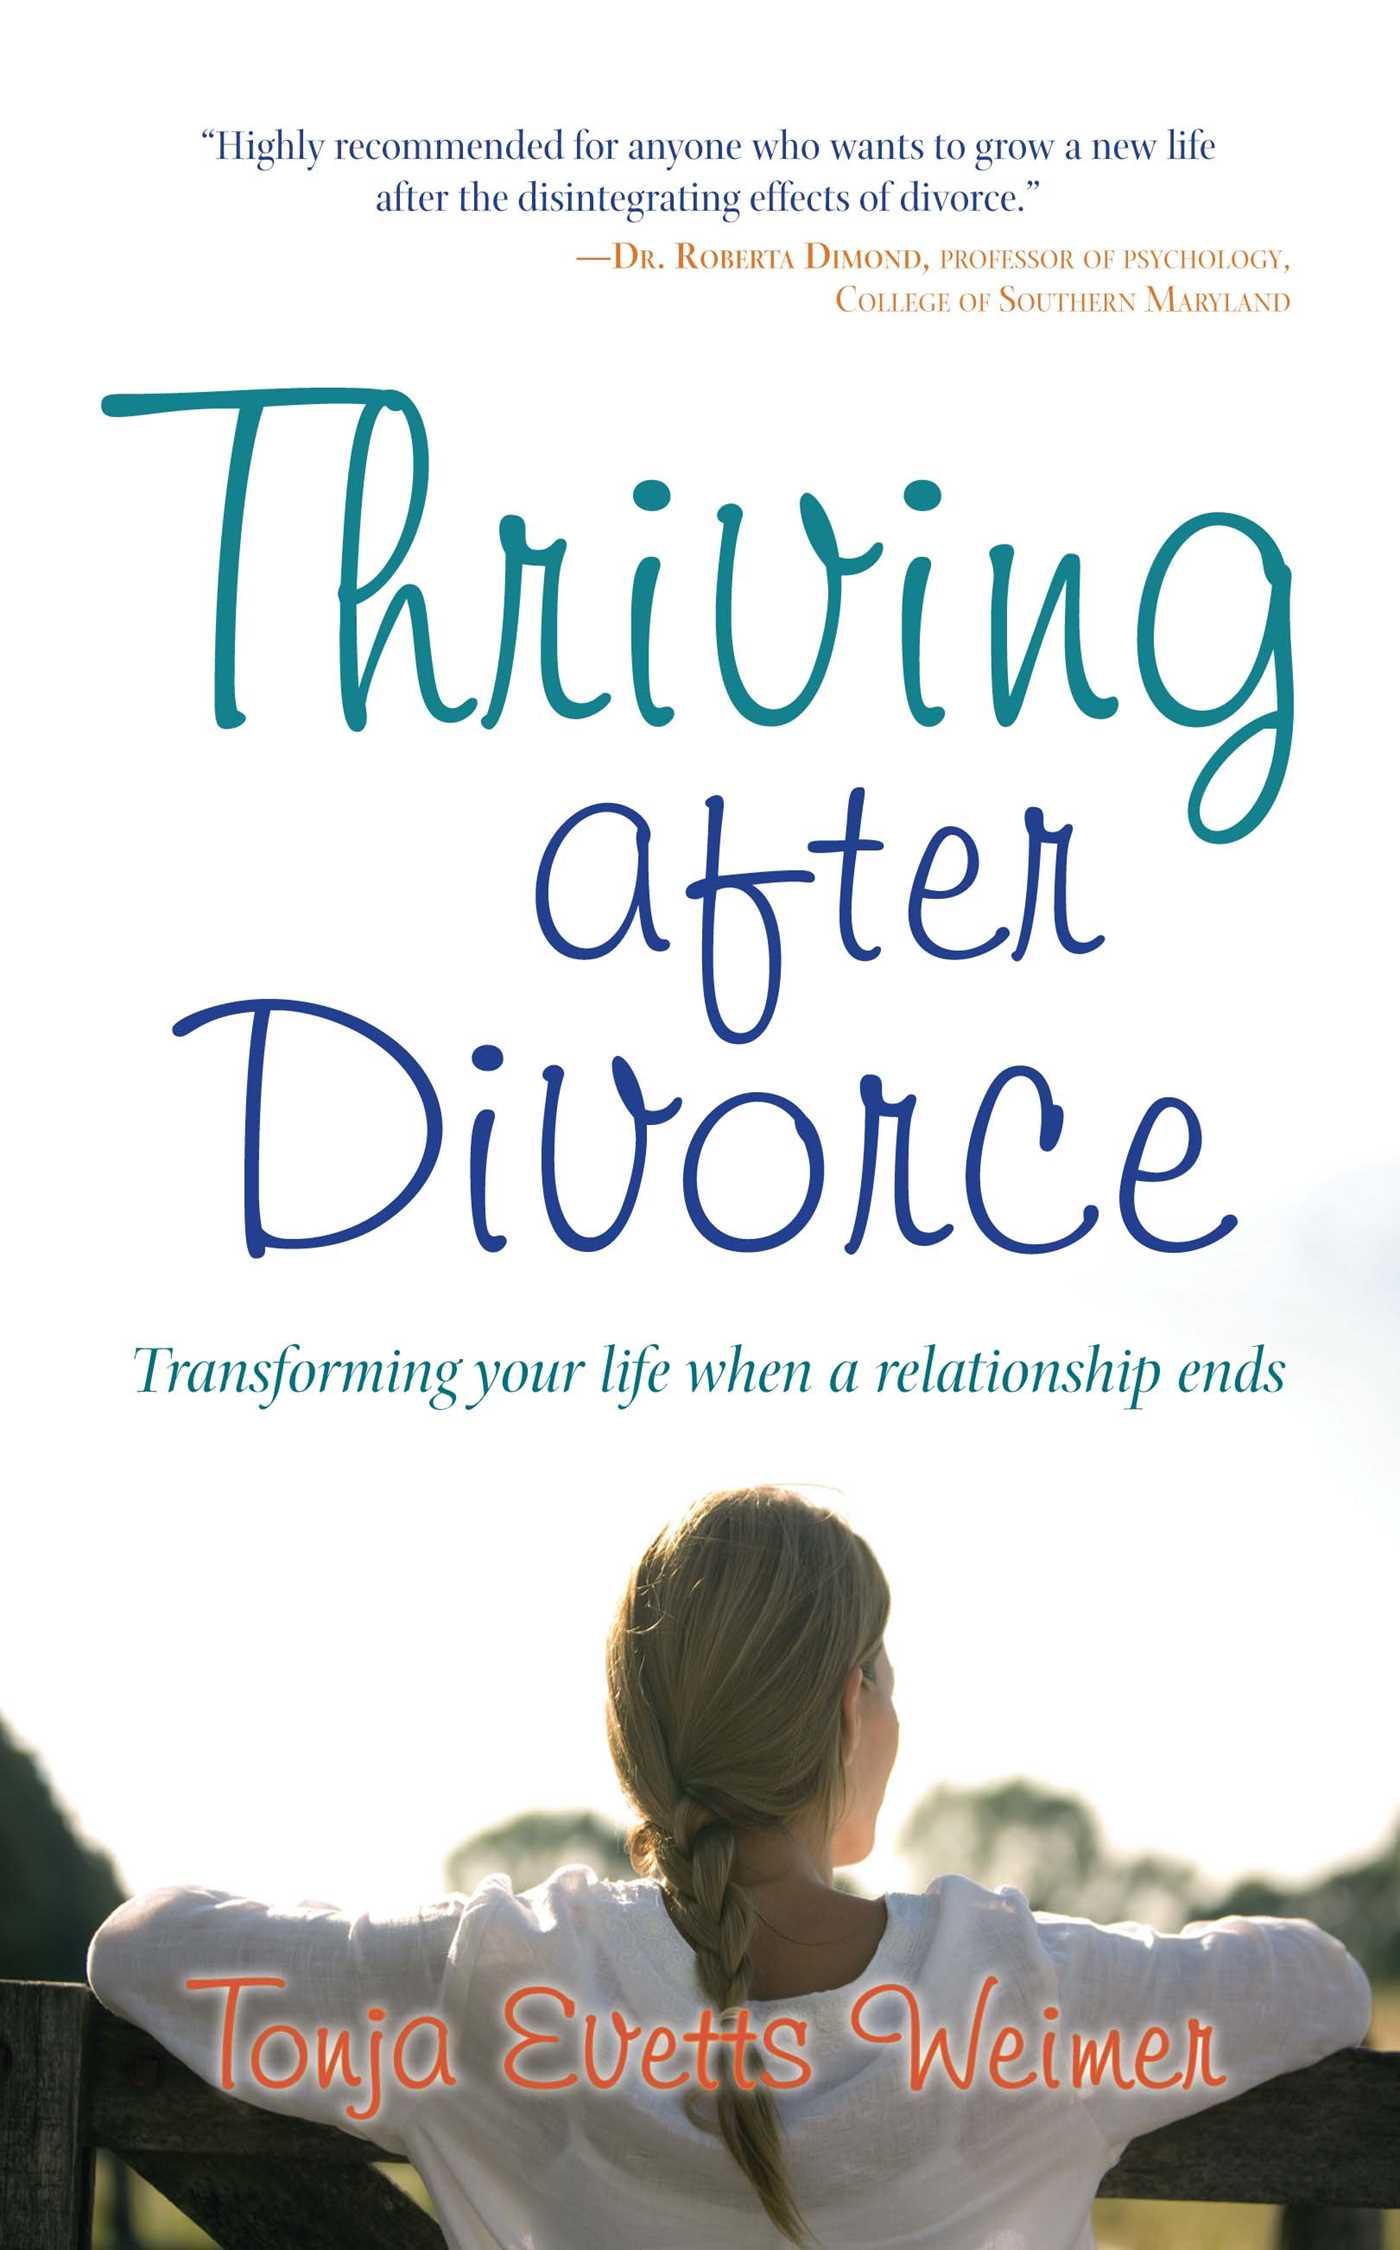 New life after divorce